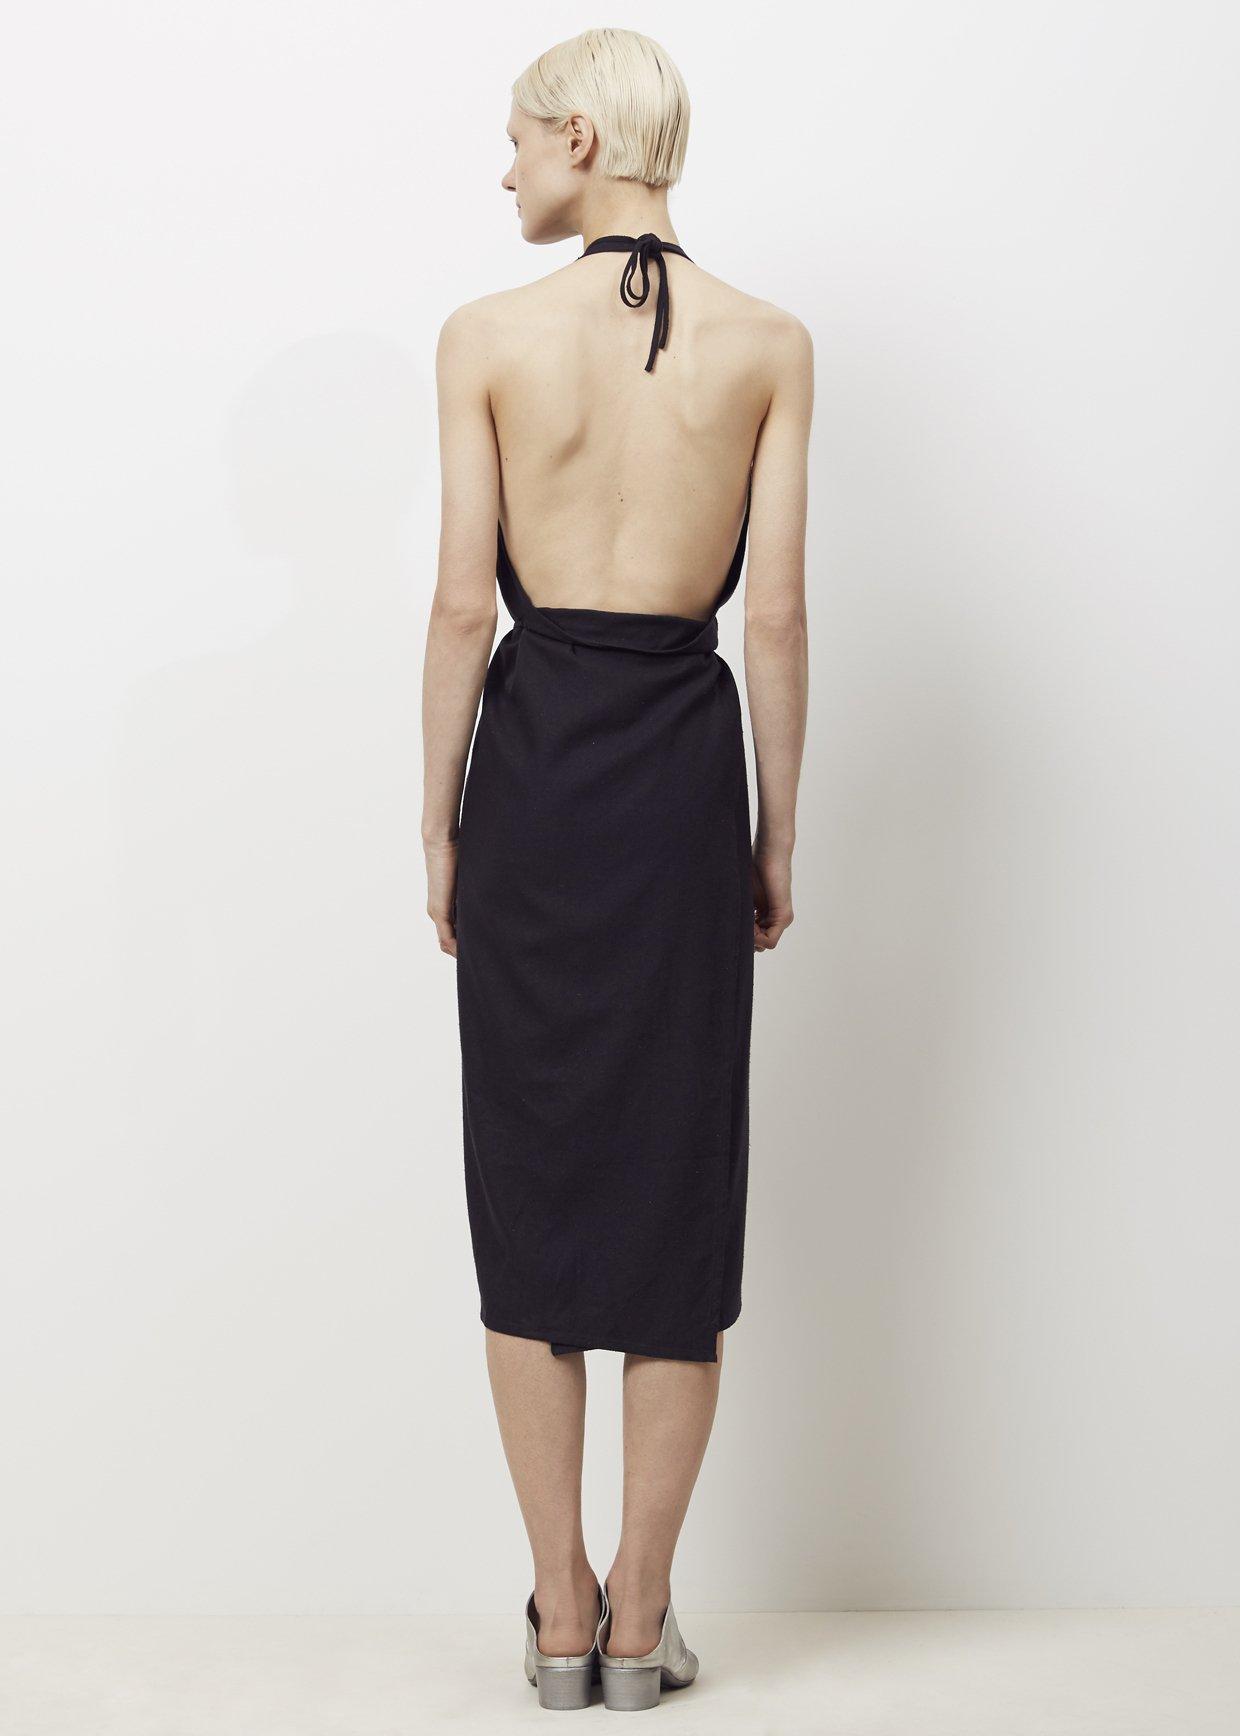 Black Dress Apron